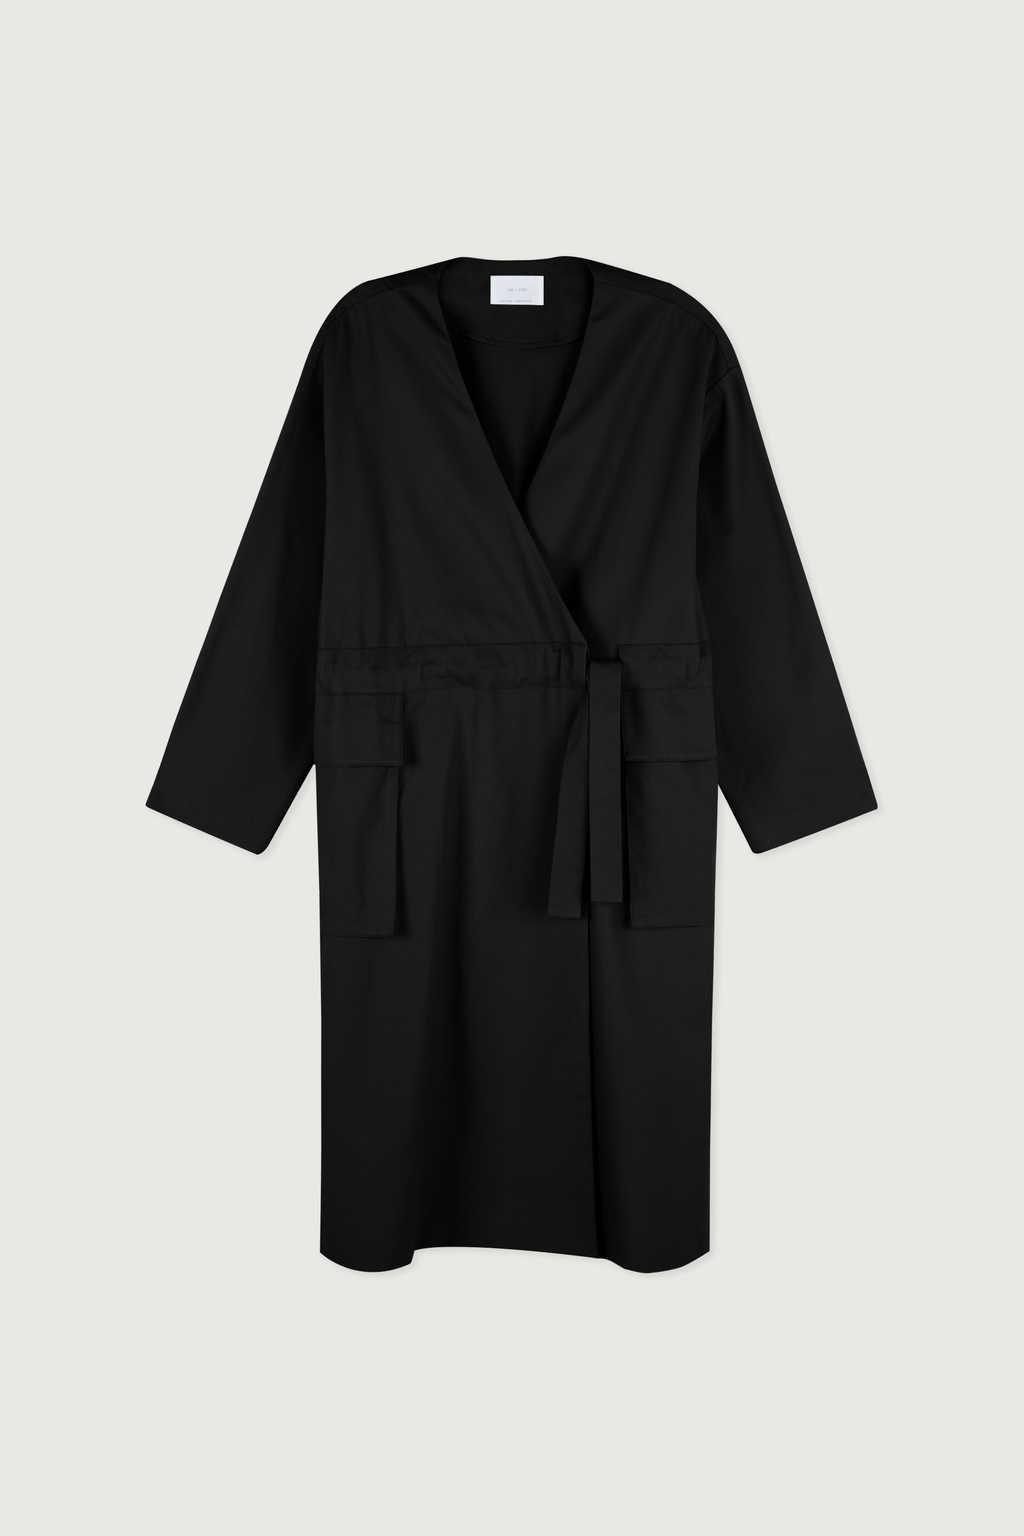 Jacket 2970 Black 8